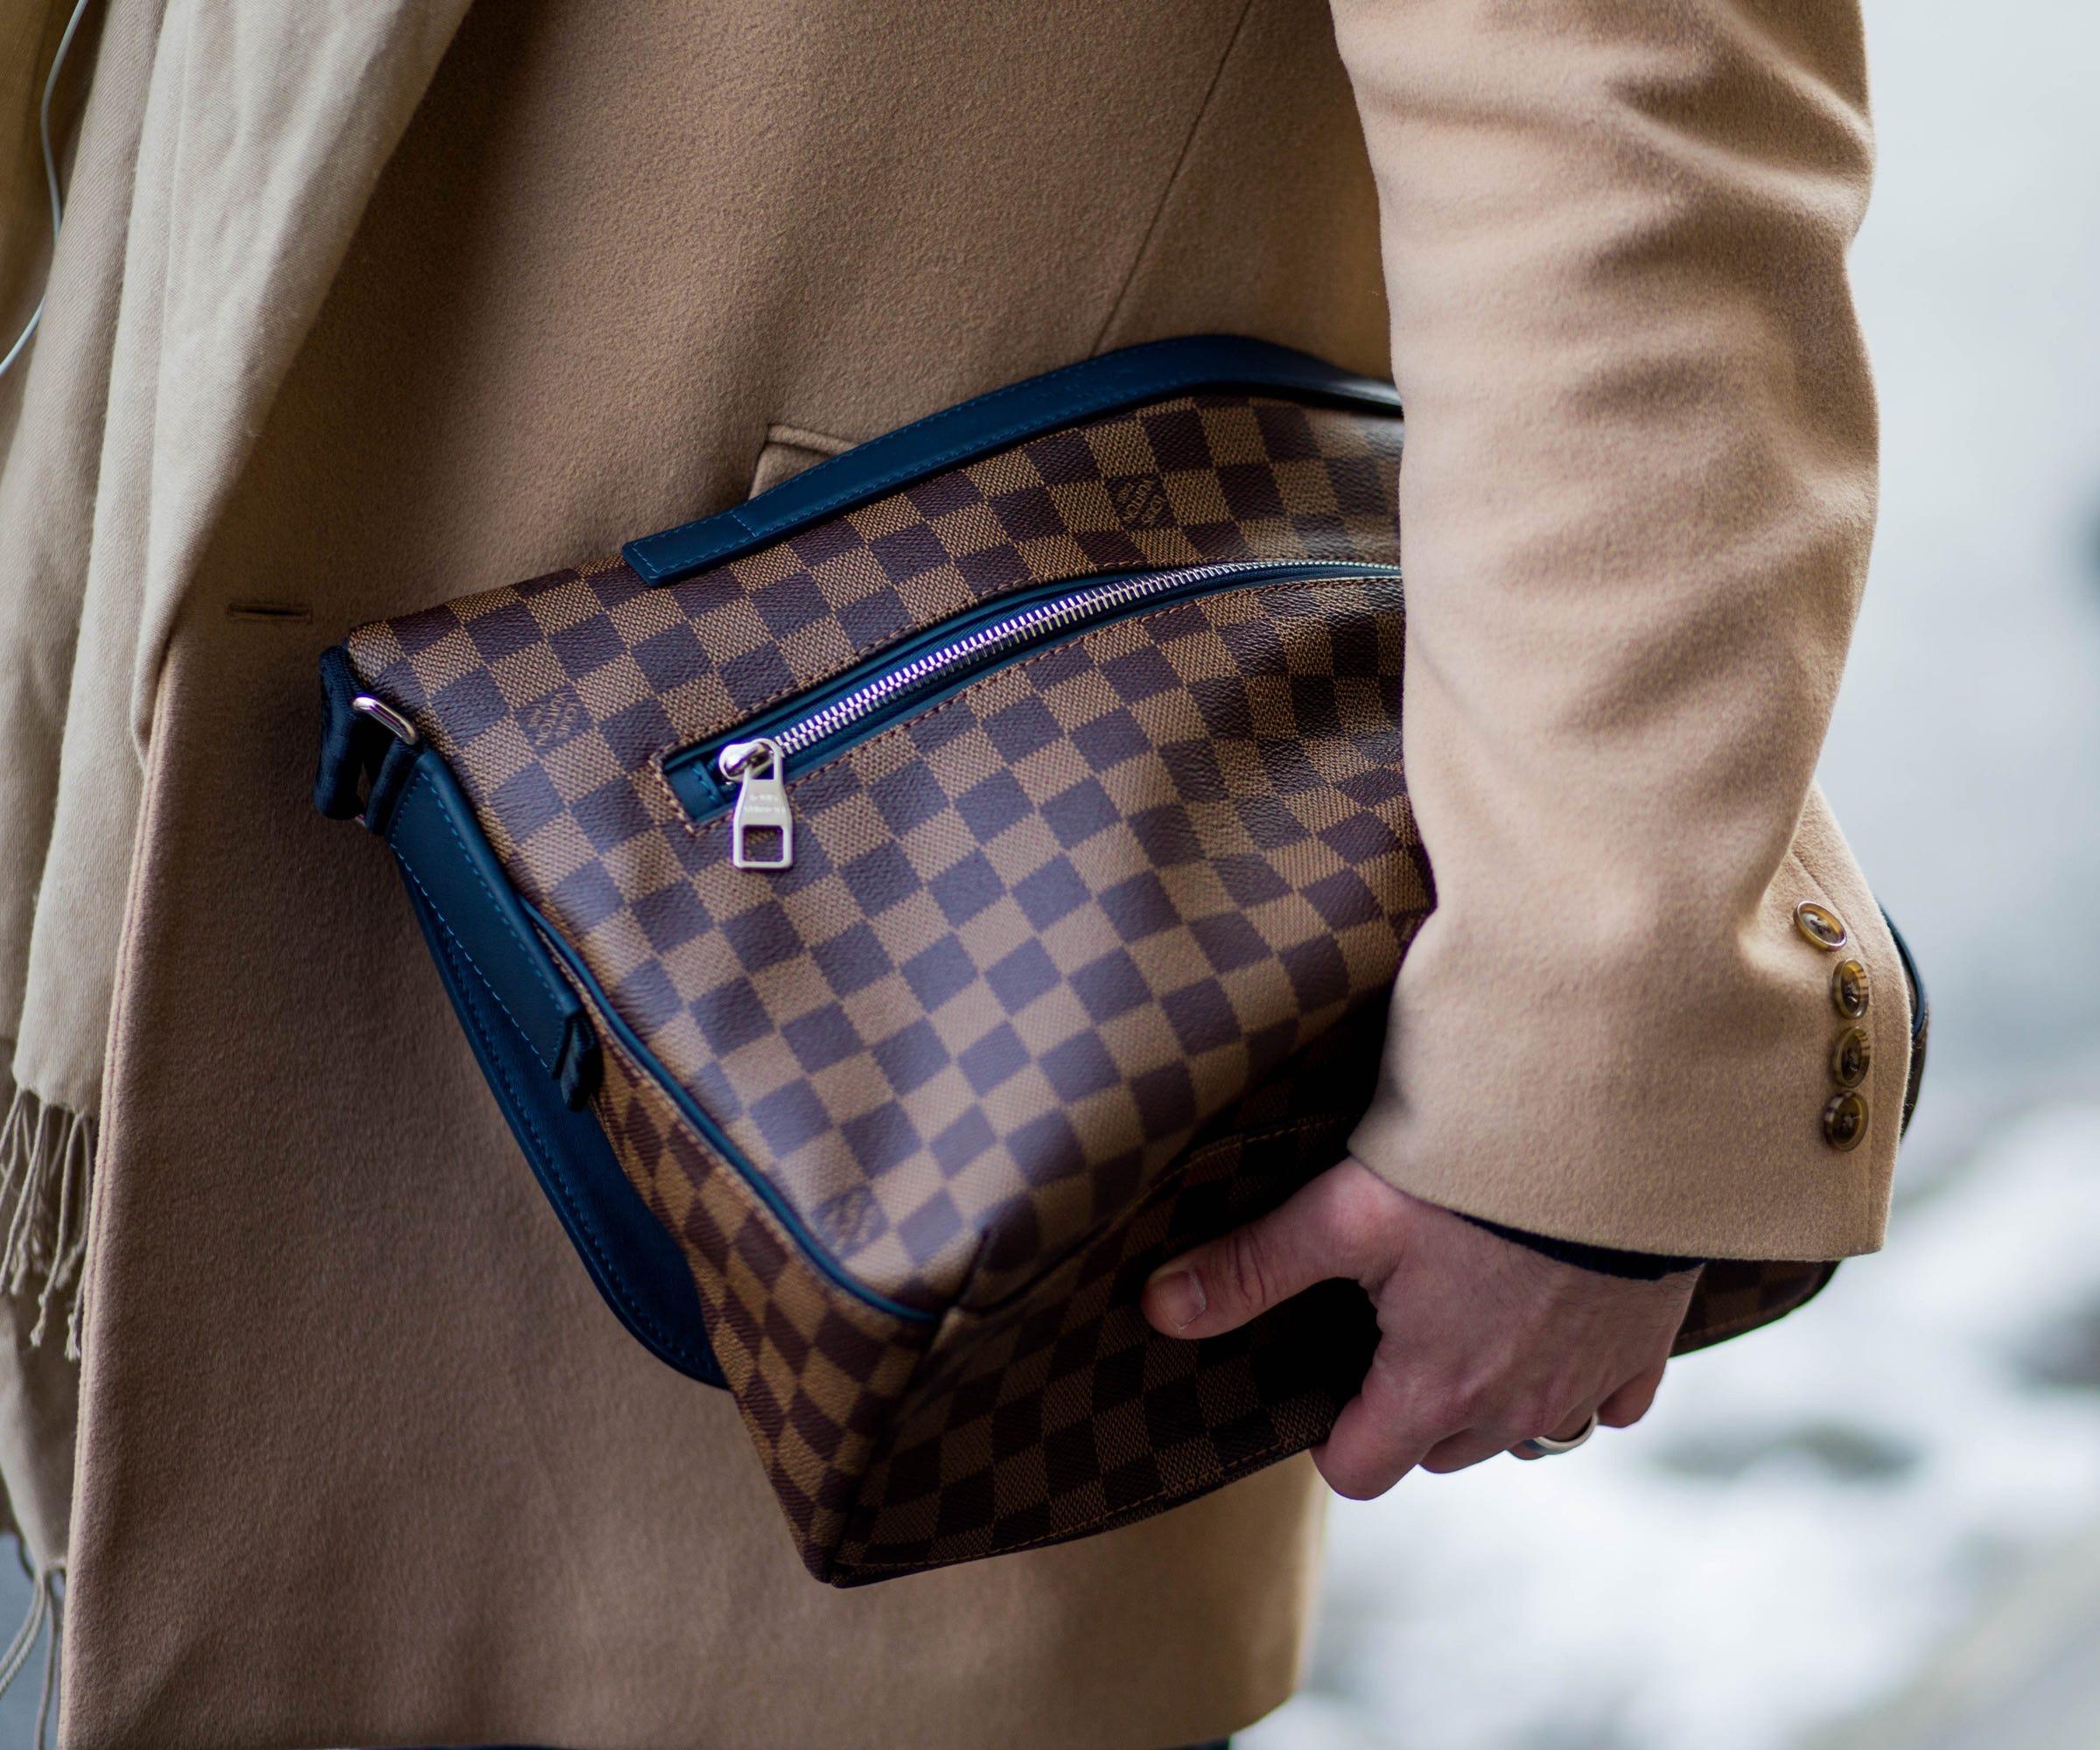 louis vuitton logo handbag trend street style accessory